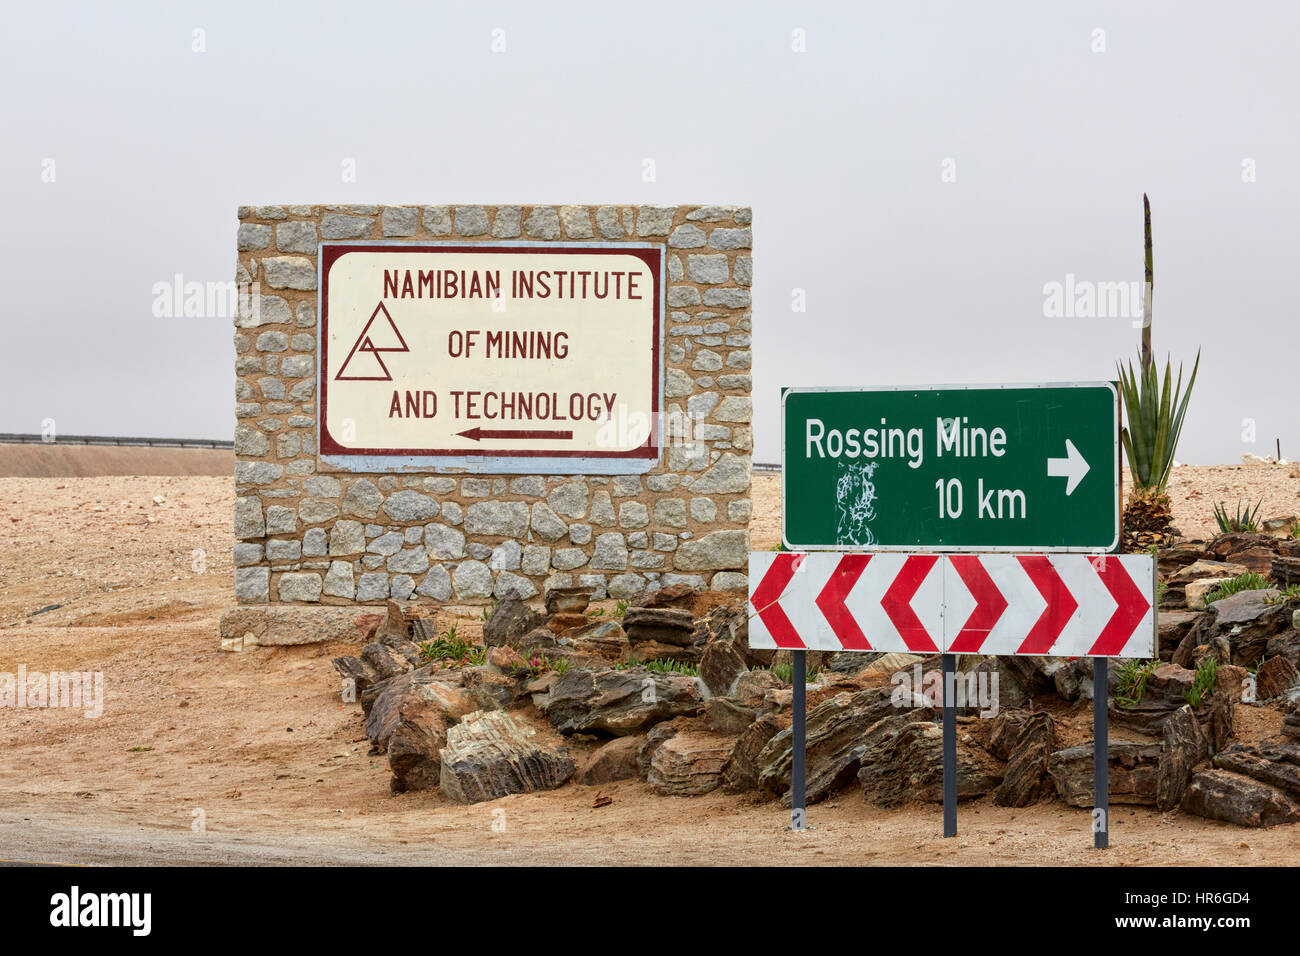 Namibian Institute of Mining and Technology sign, Arandis, Namibia, Africa - Stock Image